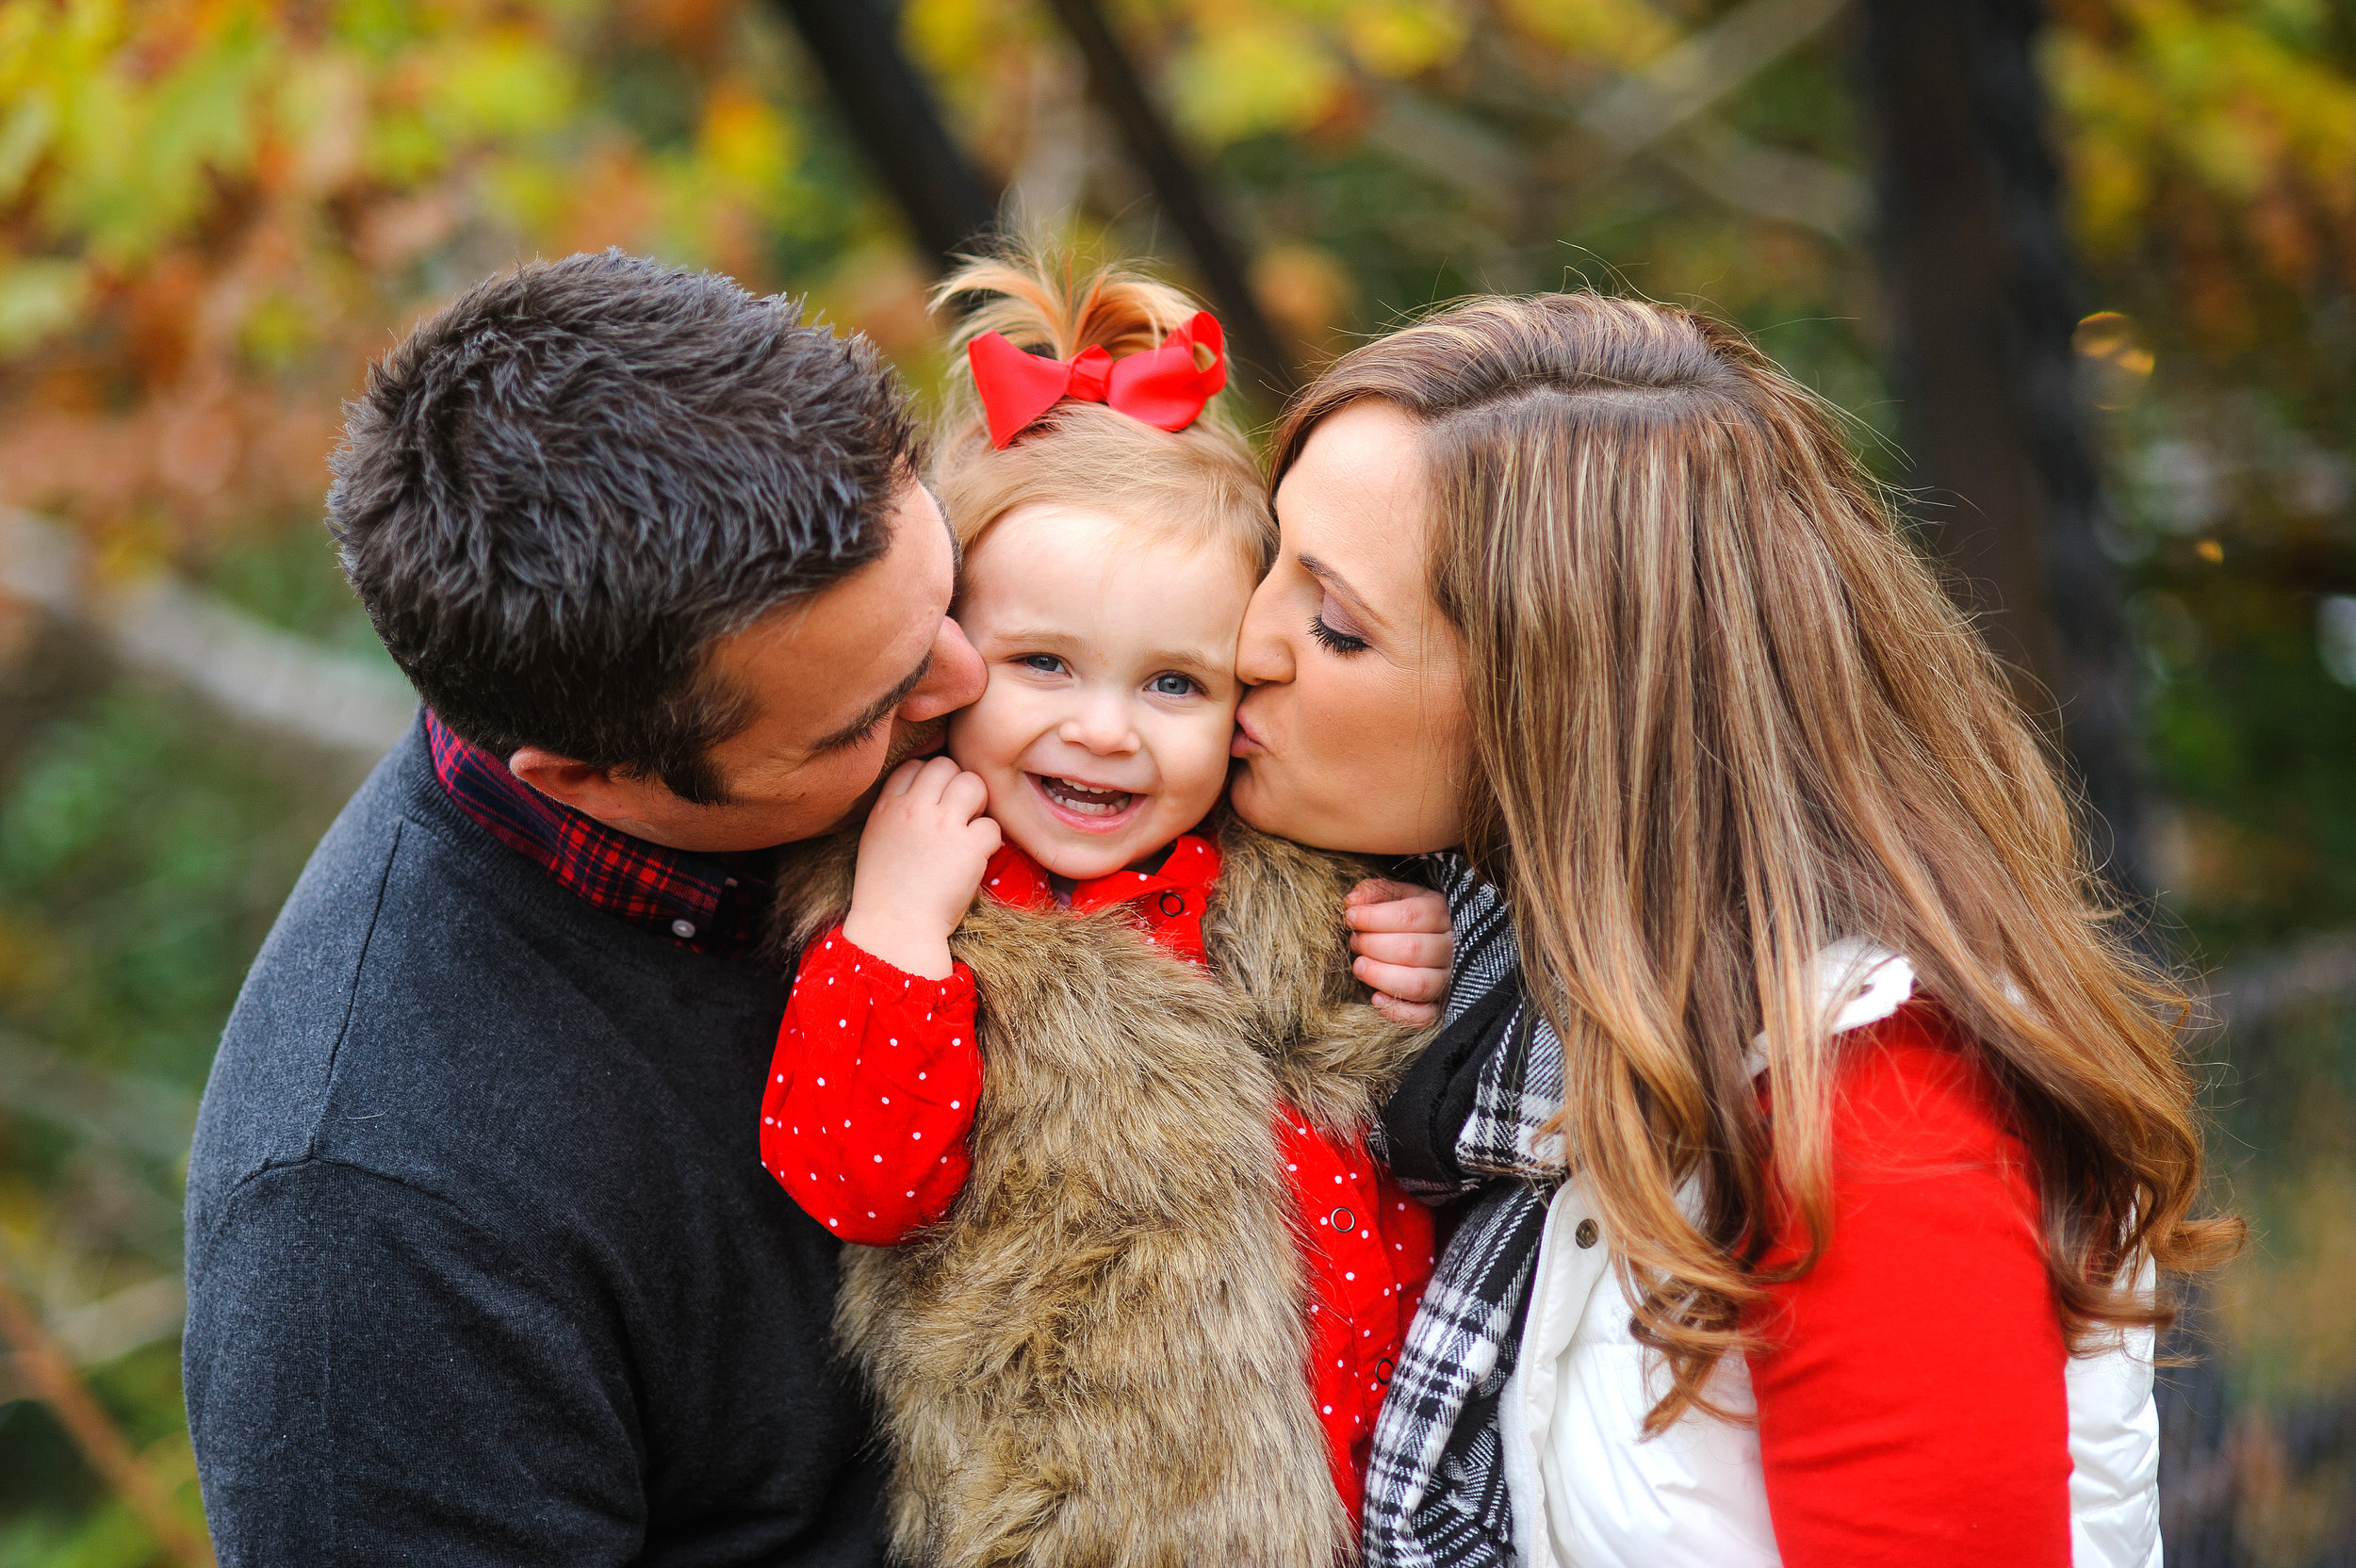 hodge-family-106-sacramento-family-photographer-katherine-nicole-photography.JPG